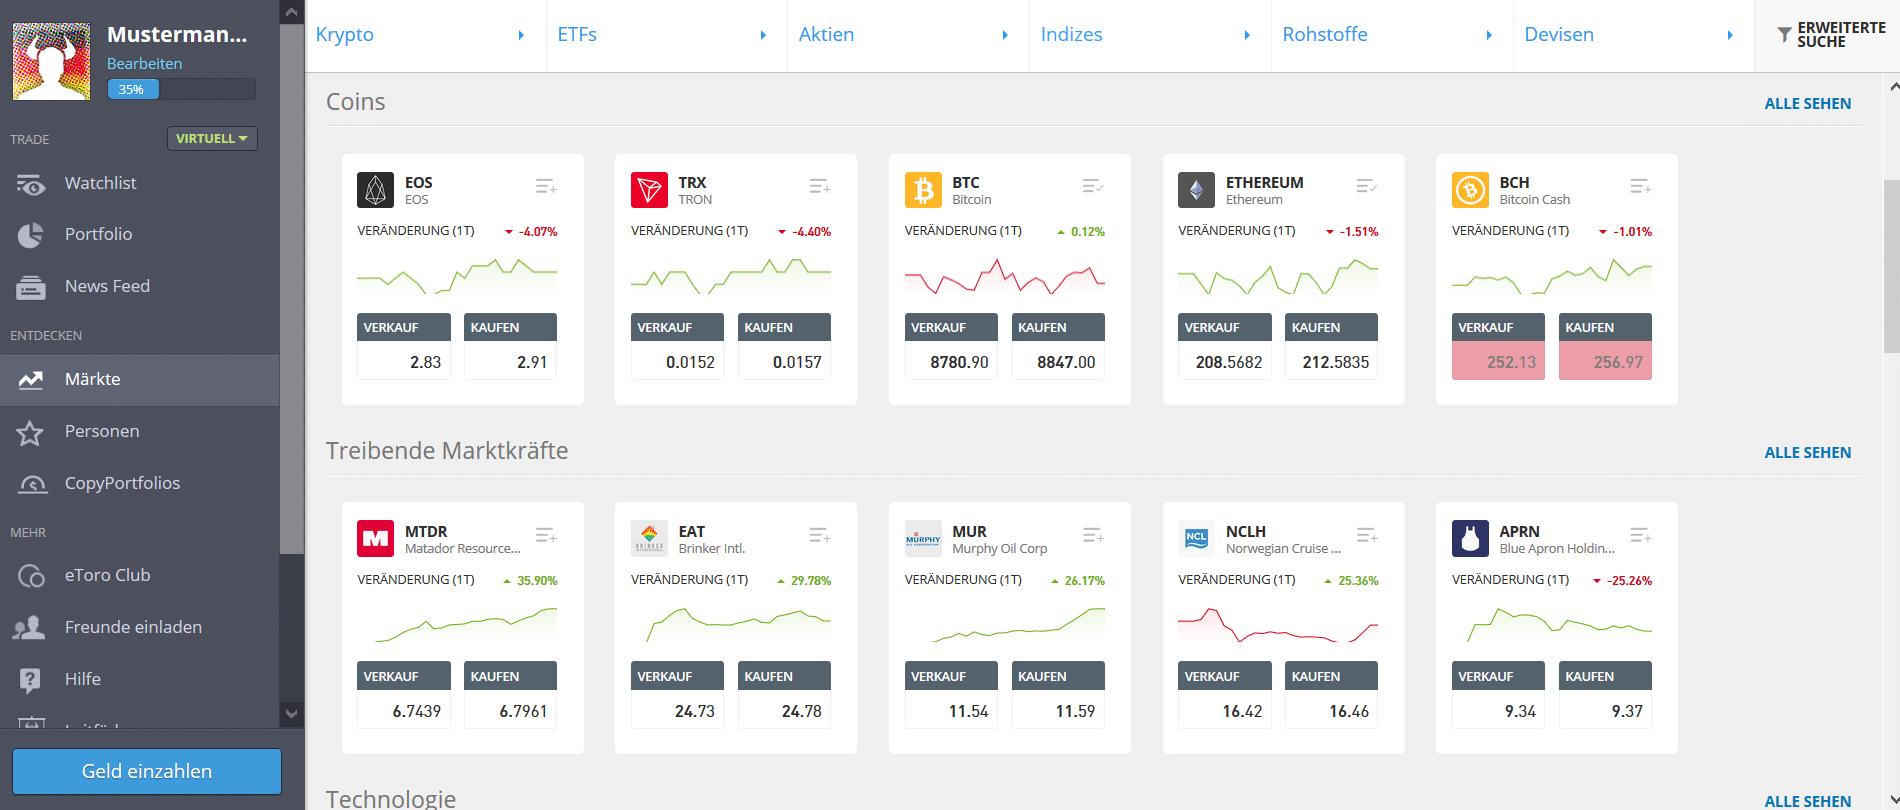 wie kann man in kryptowährung 2021 investieren? bitcoin broker hohe hebelwirkung